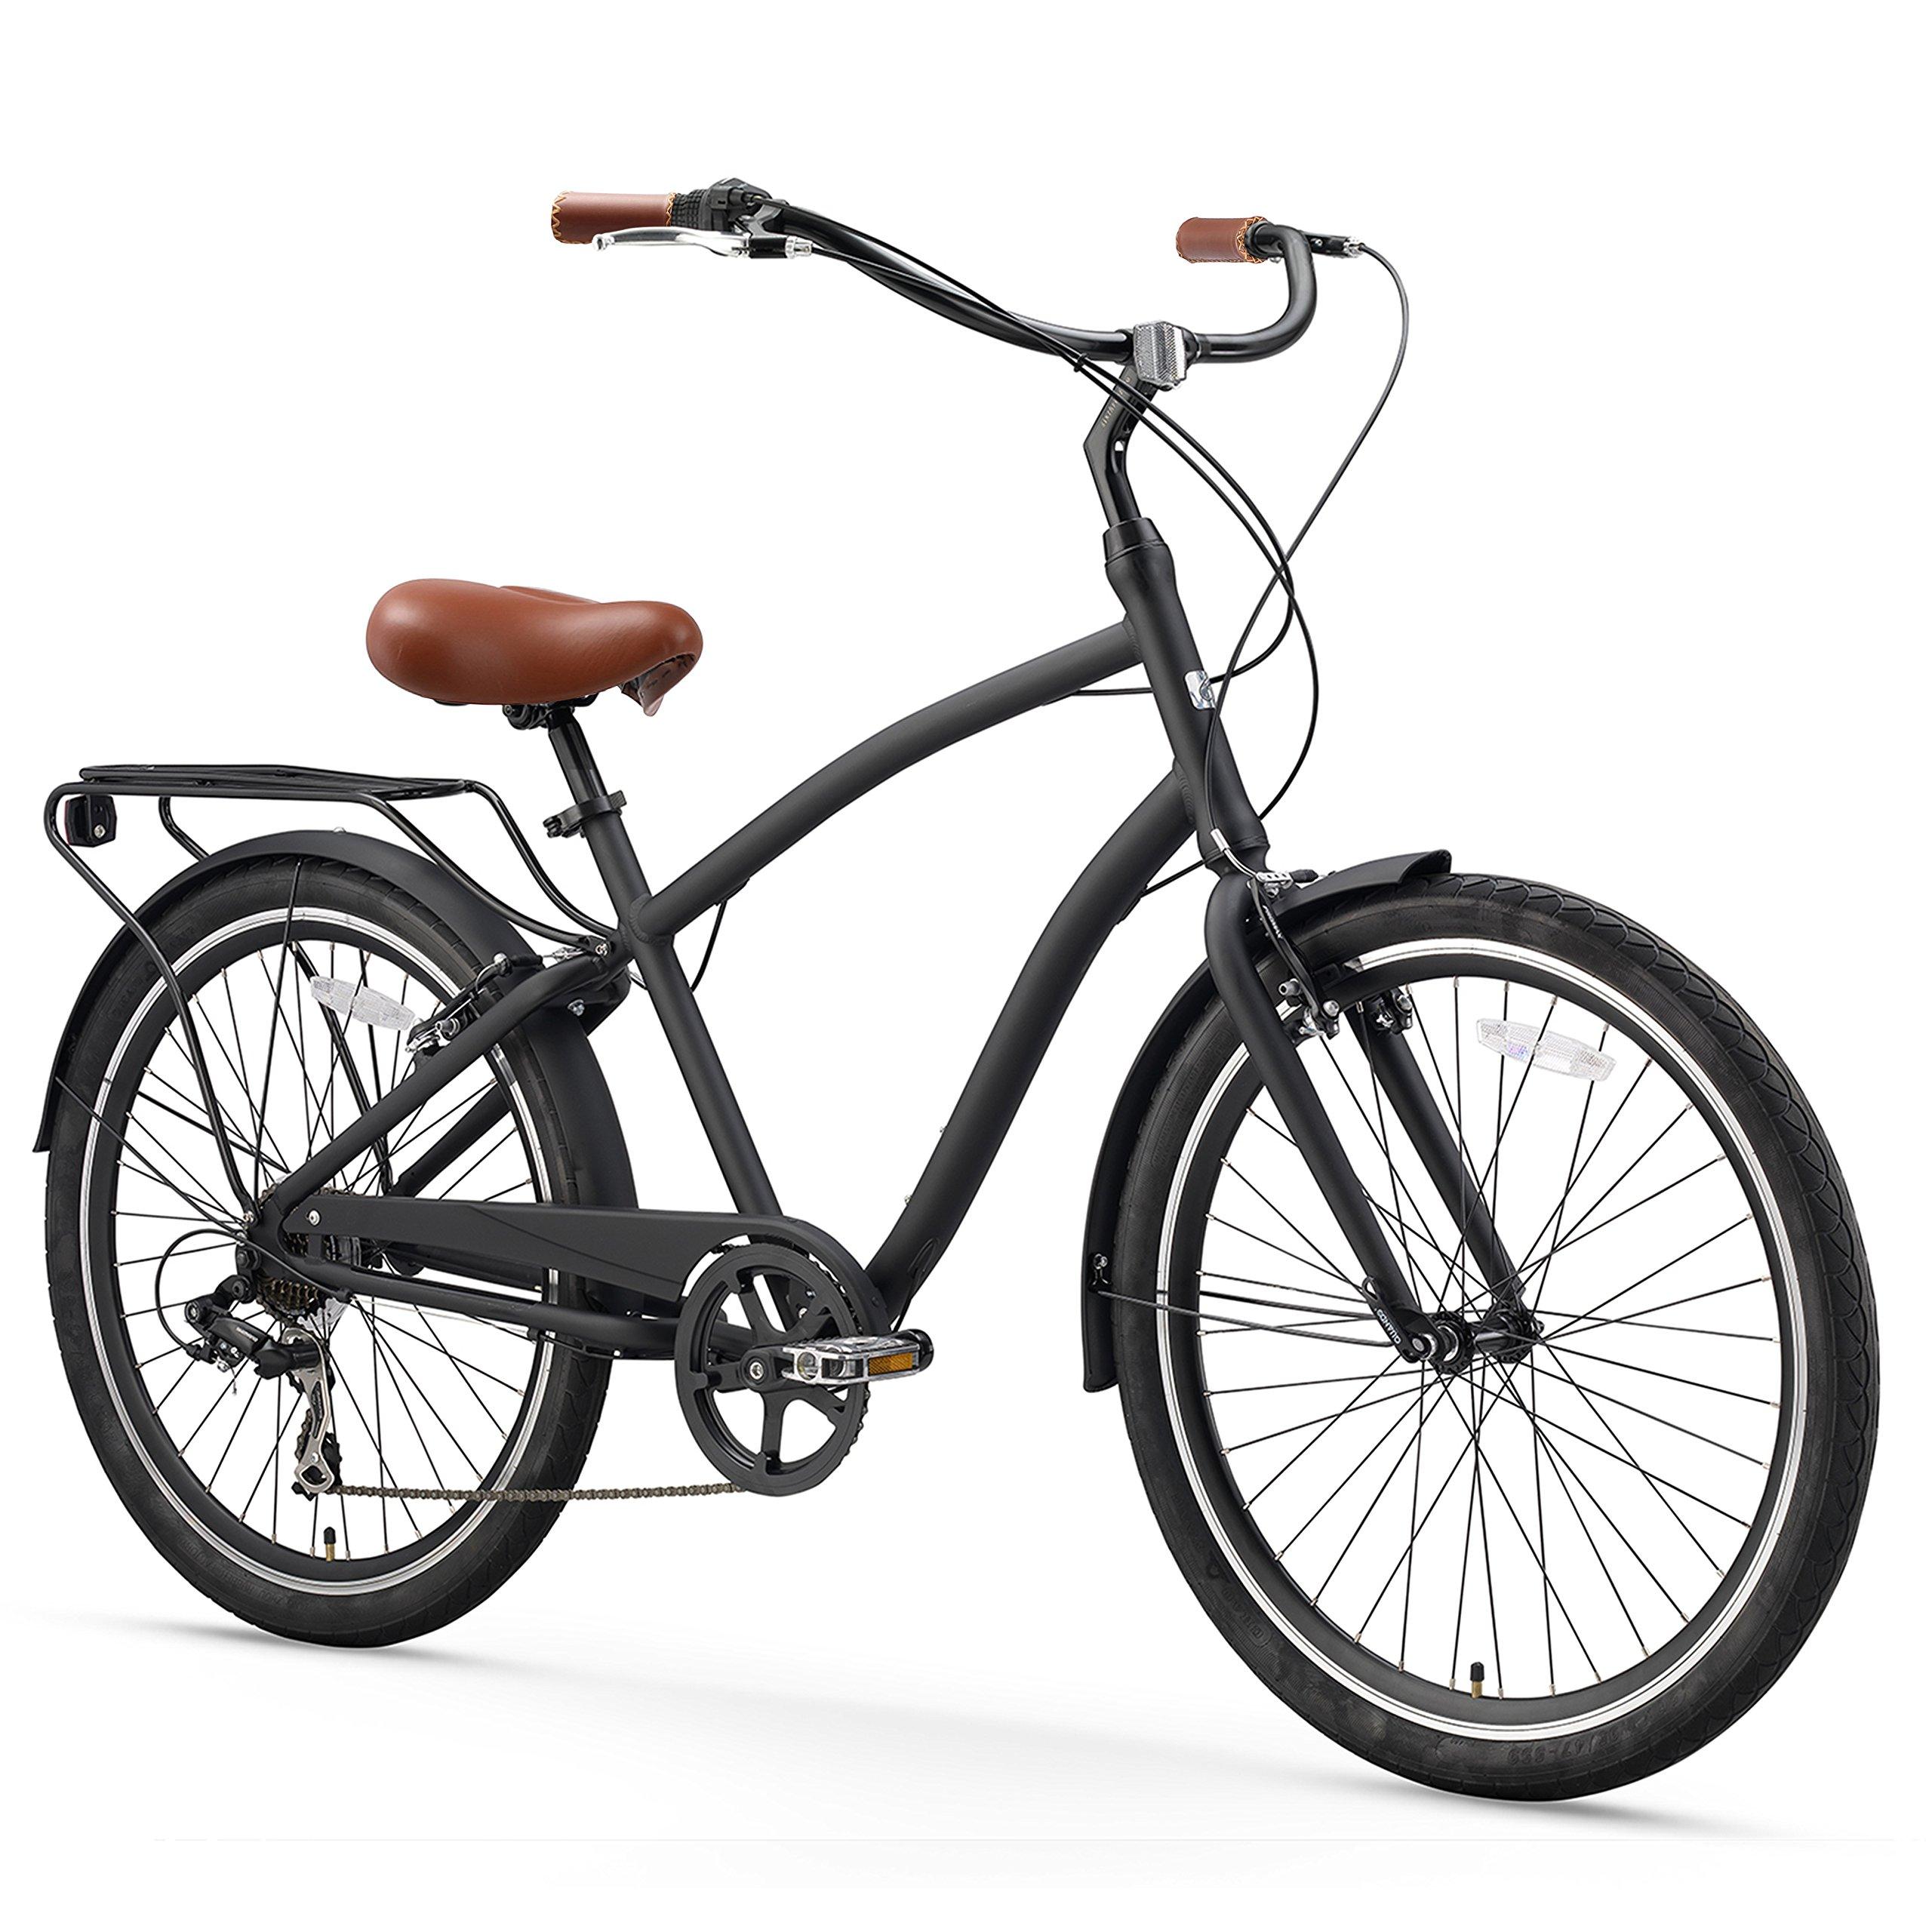 Sixthreezero Evryjourney Mens 26 Inch Hybrid Cruiser Bicycle, Matte Black Product